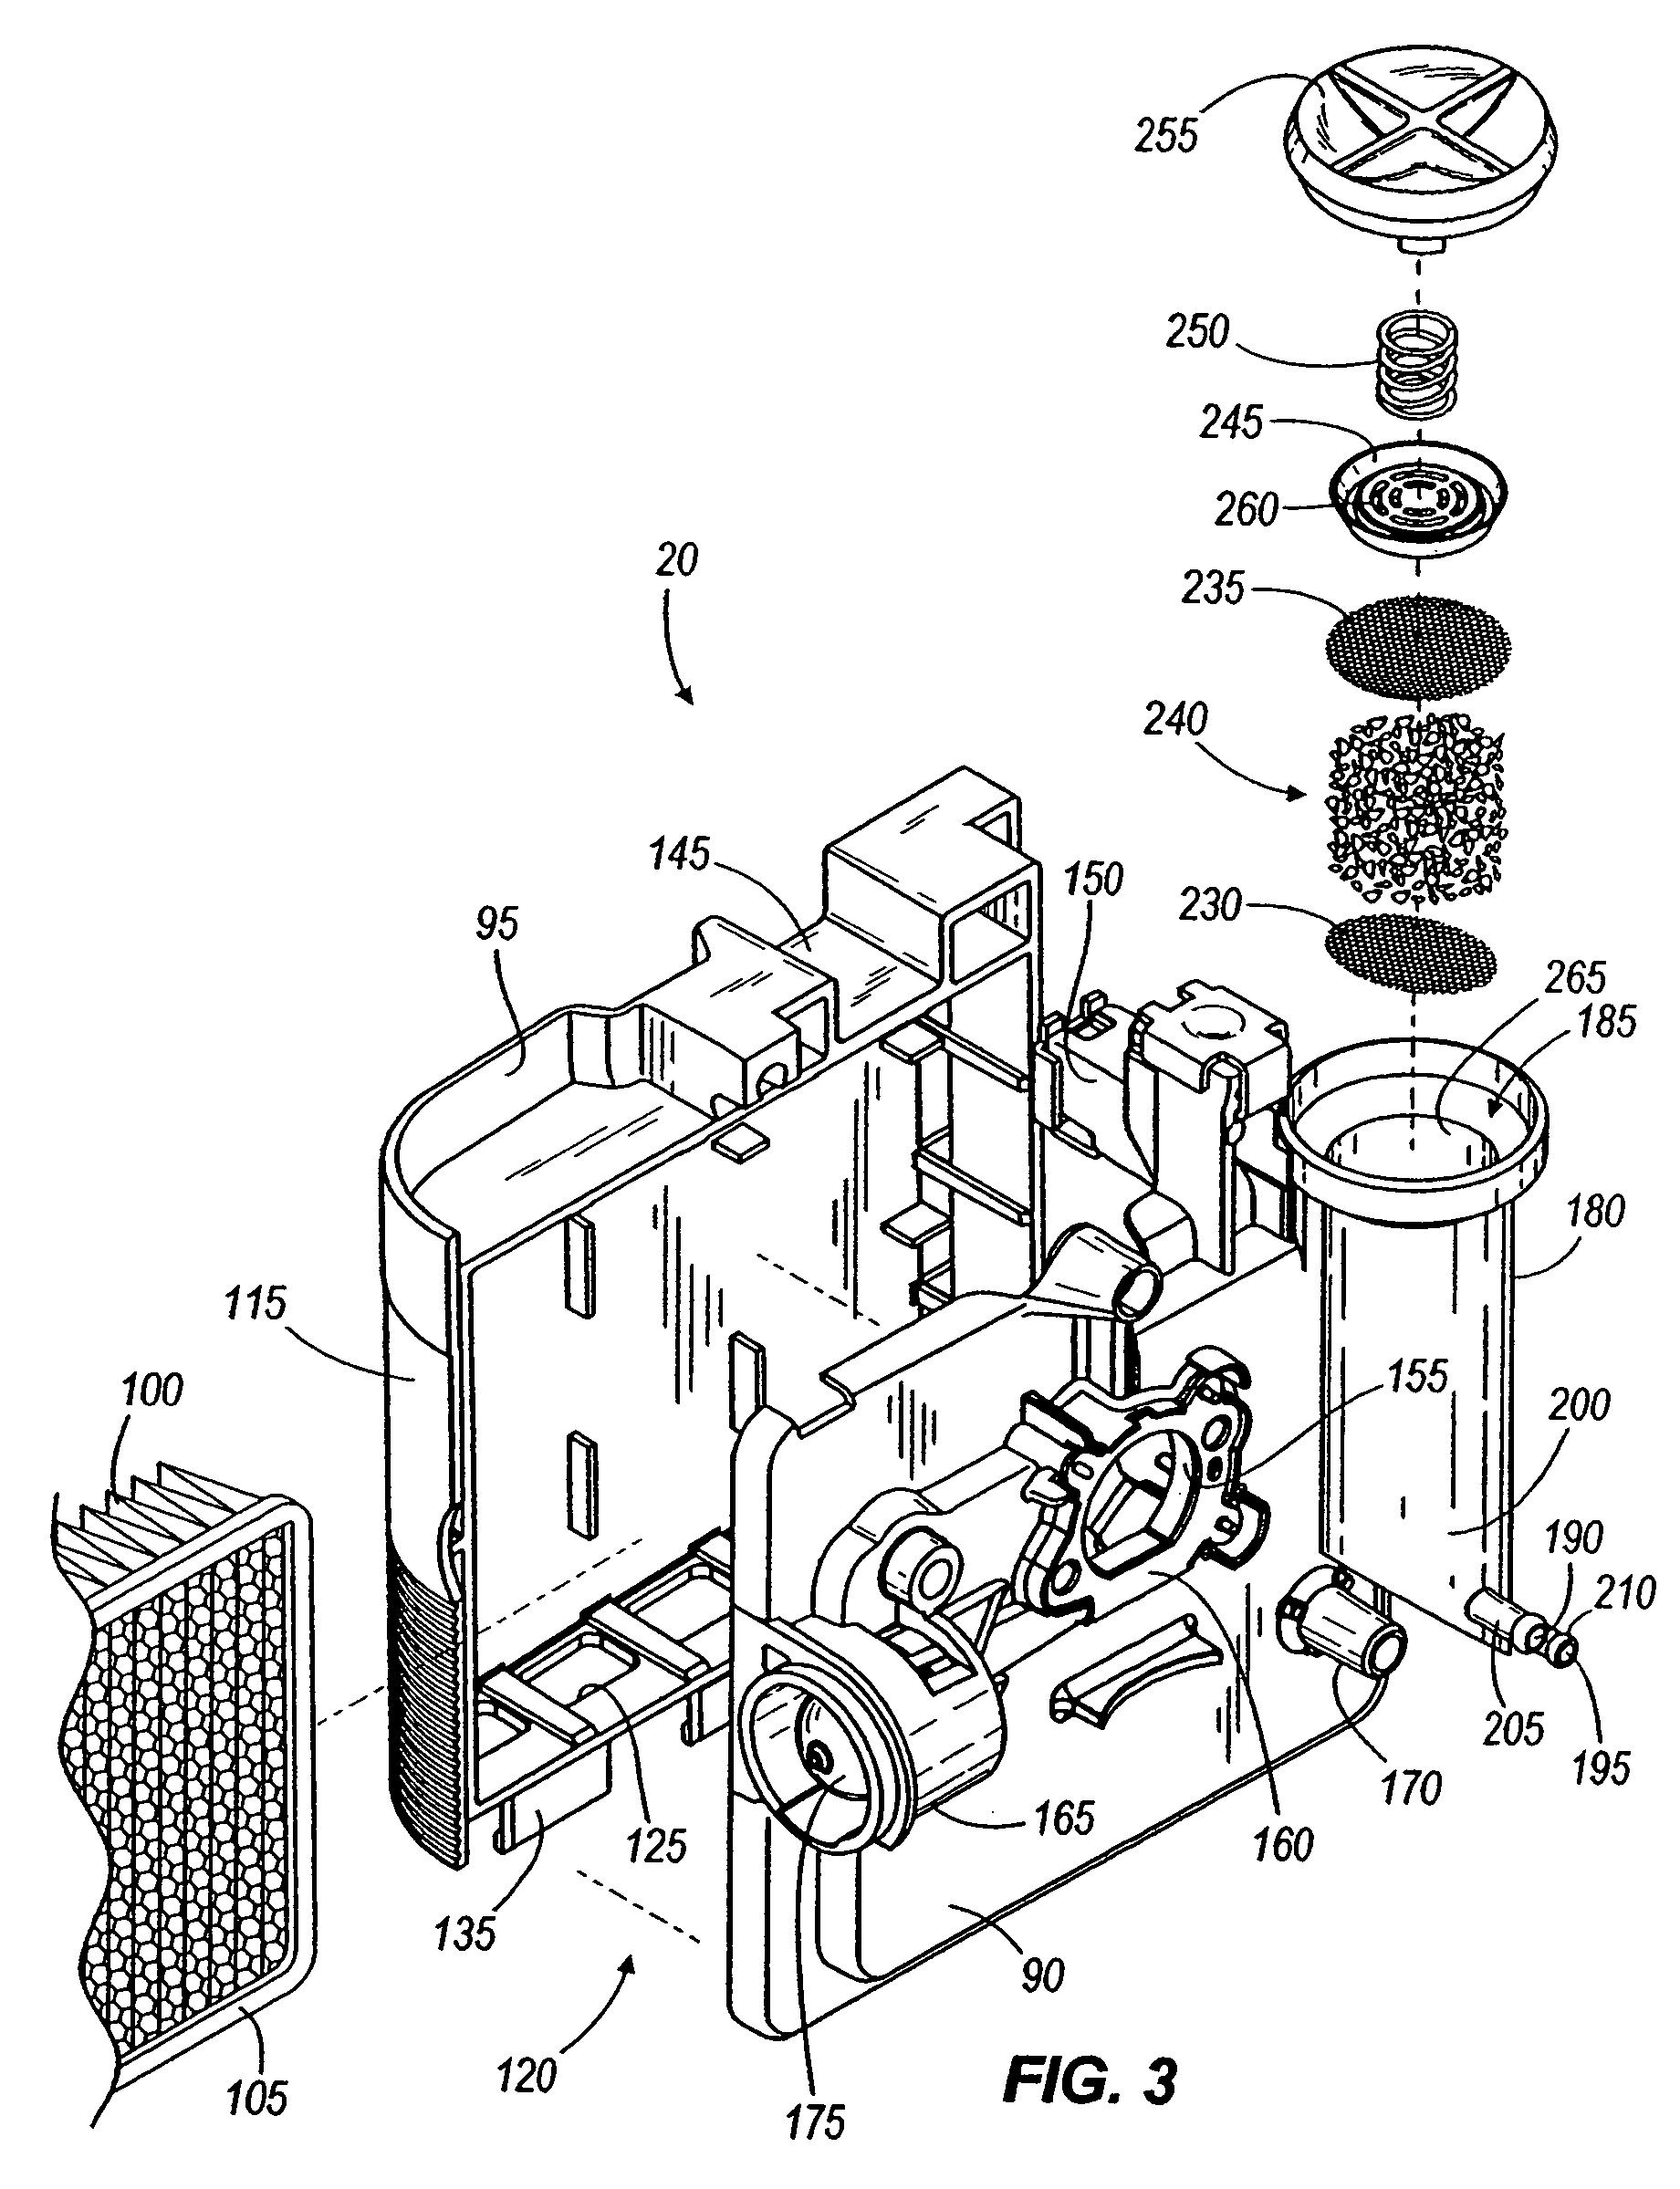 internal engine cleaner uk